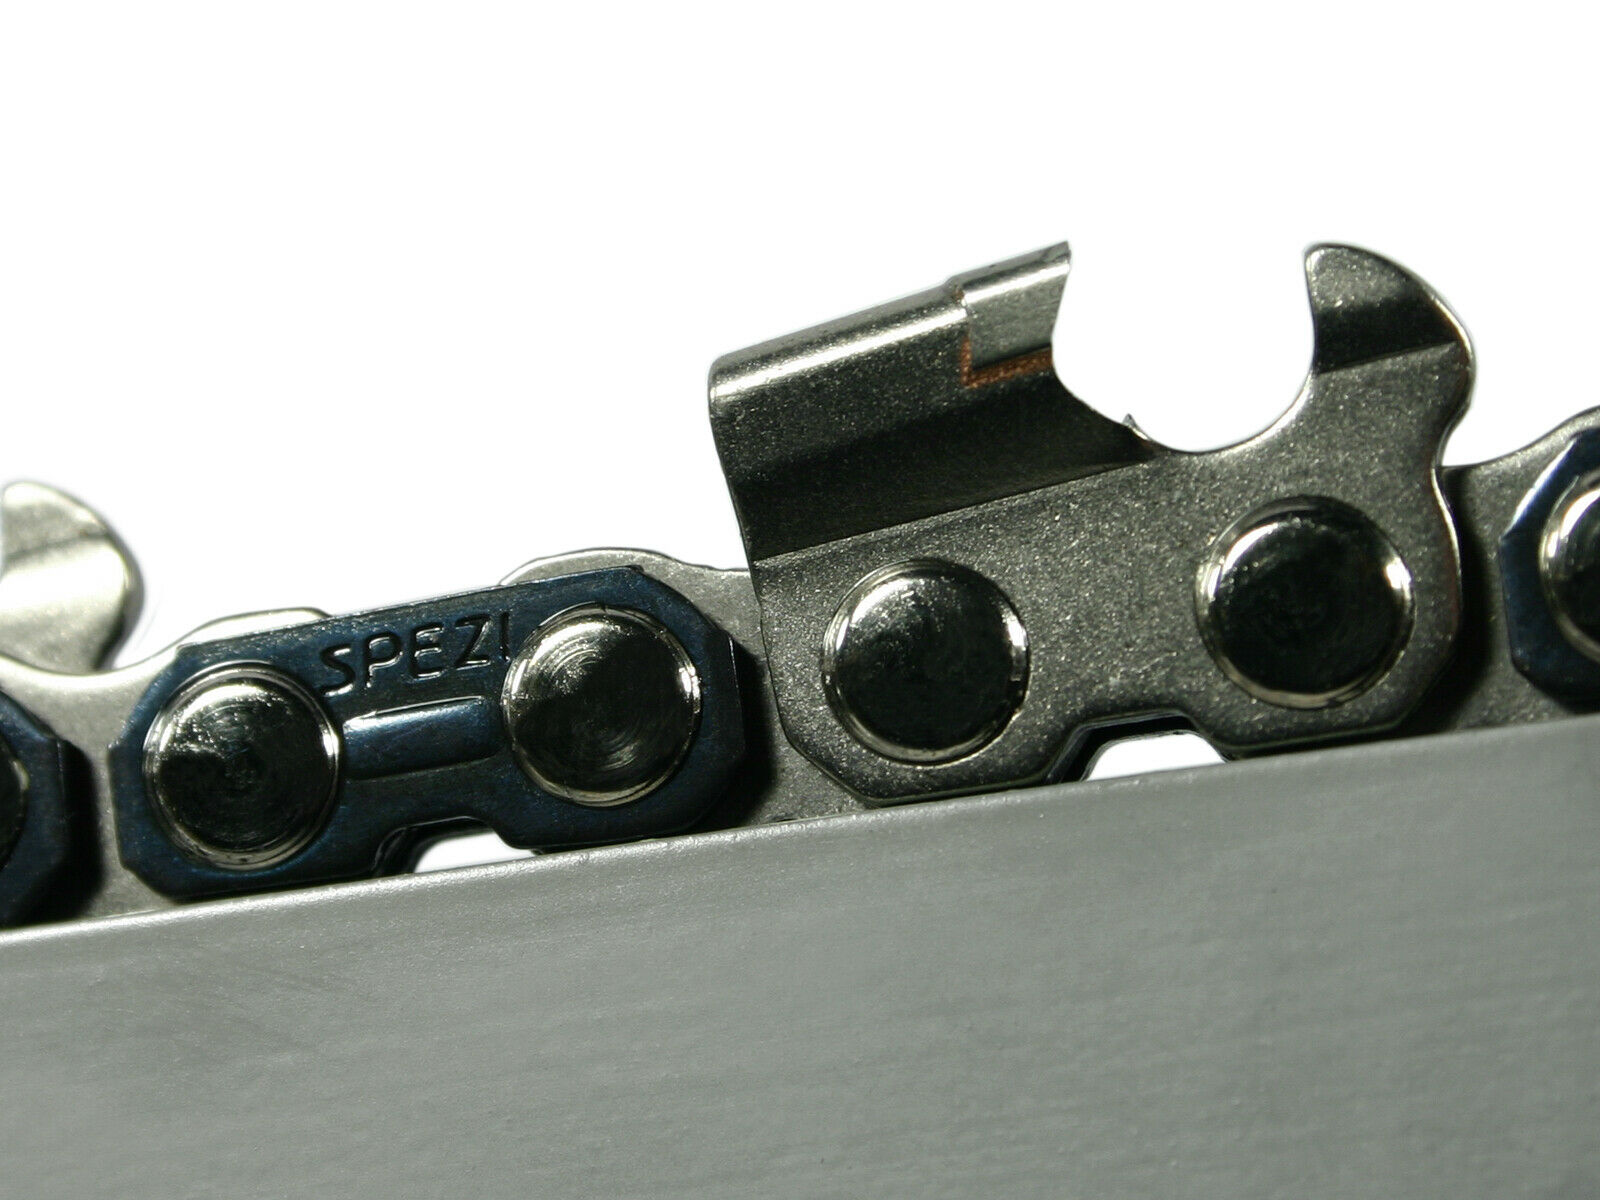 Metal duro cadena sierra adecuado para Husqvarna 41 43 cm 3 8  64 TG 1,5 mm Cochebide